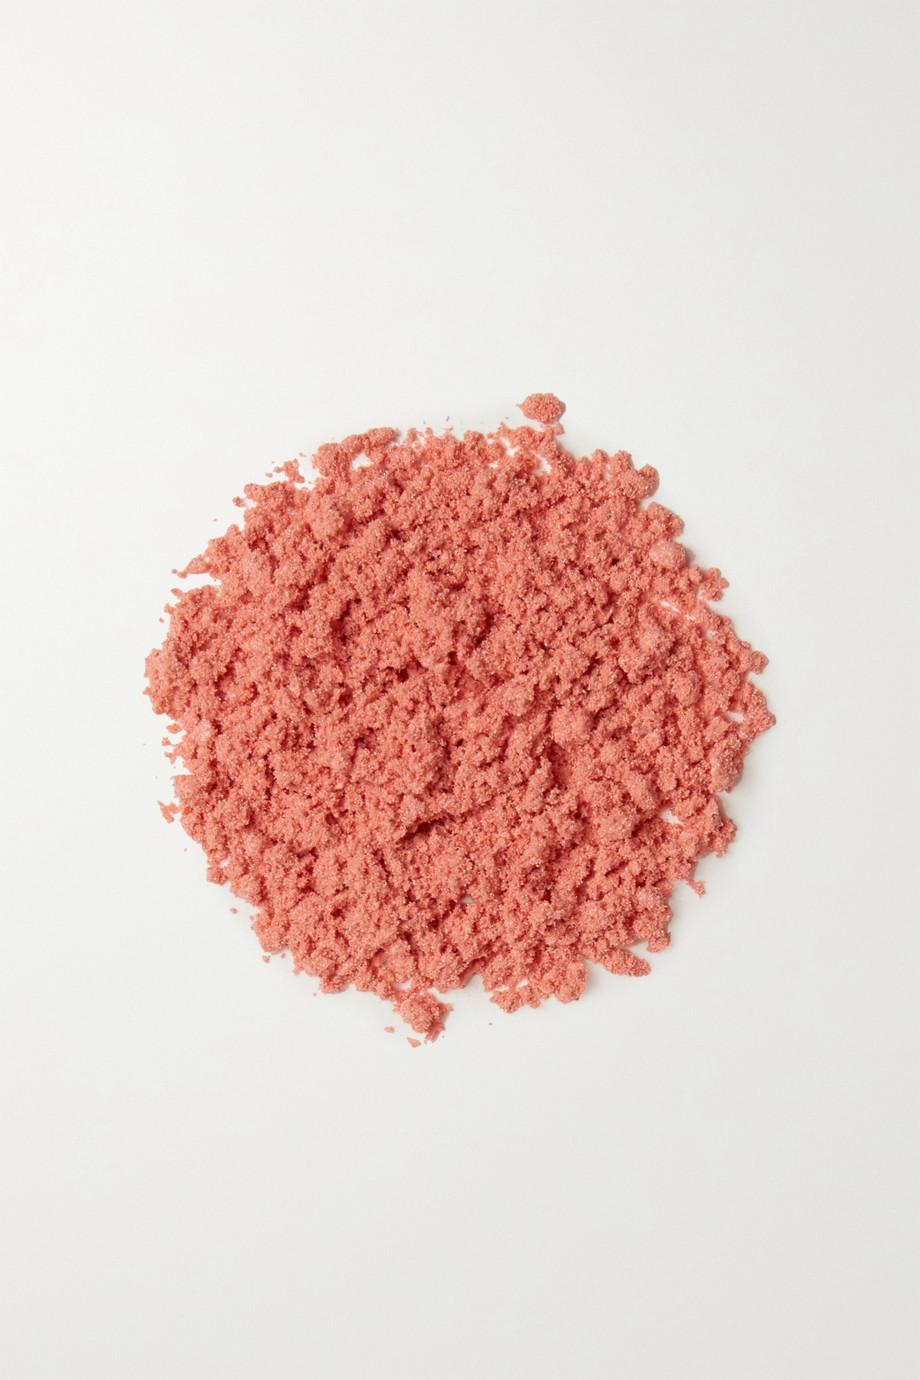 Estée Lauder Act IV Party Puff Starlucent Filtered Powder